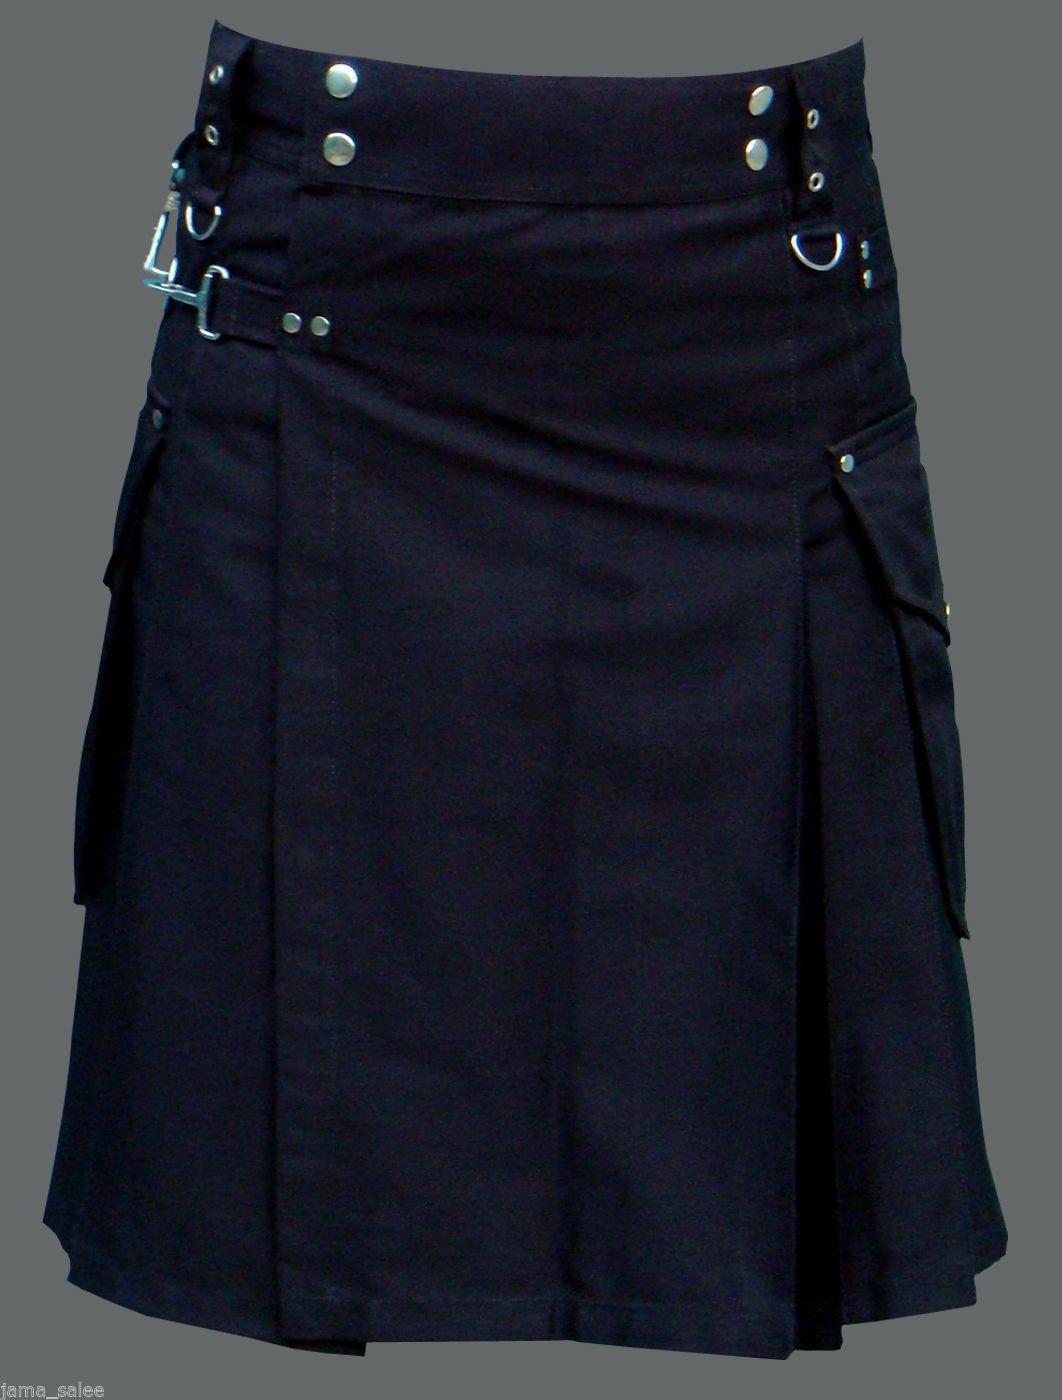 Deluxe Black Cotton Kilt Handmade Utility Gothic Modern Kilt with Cargo Pockets Waist Size 44 to Fit